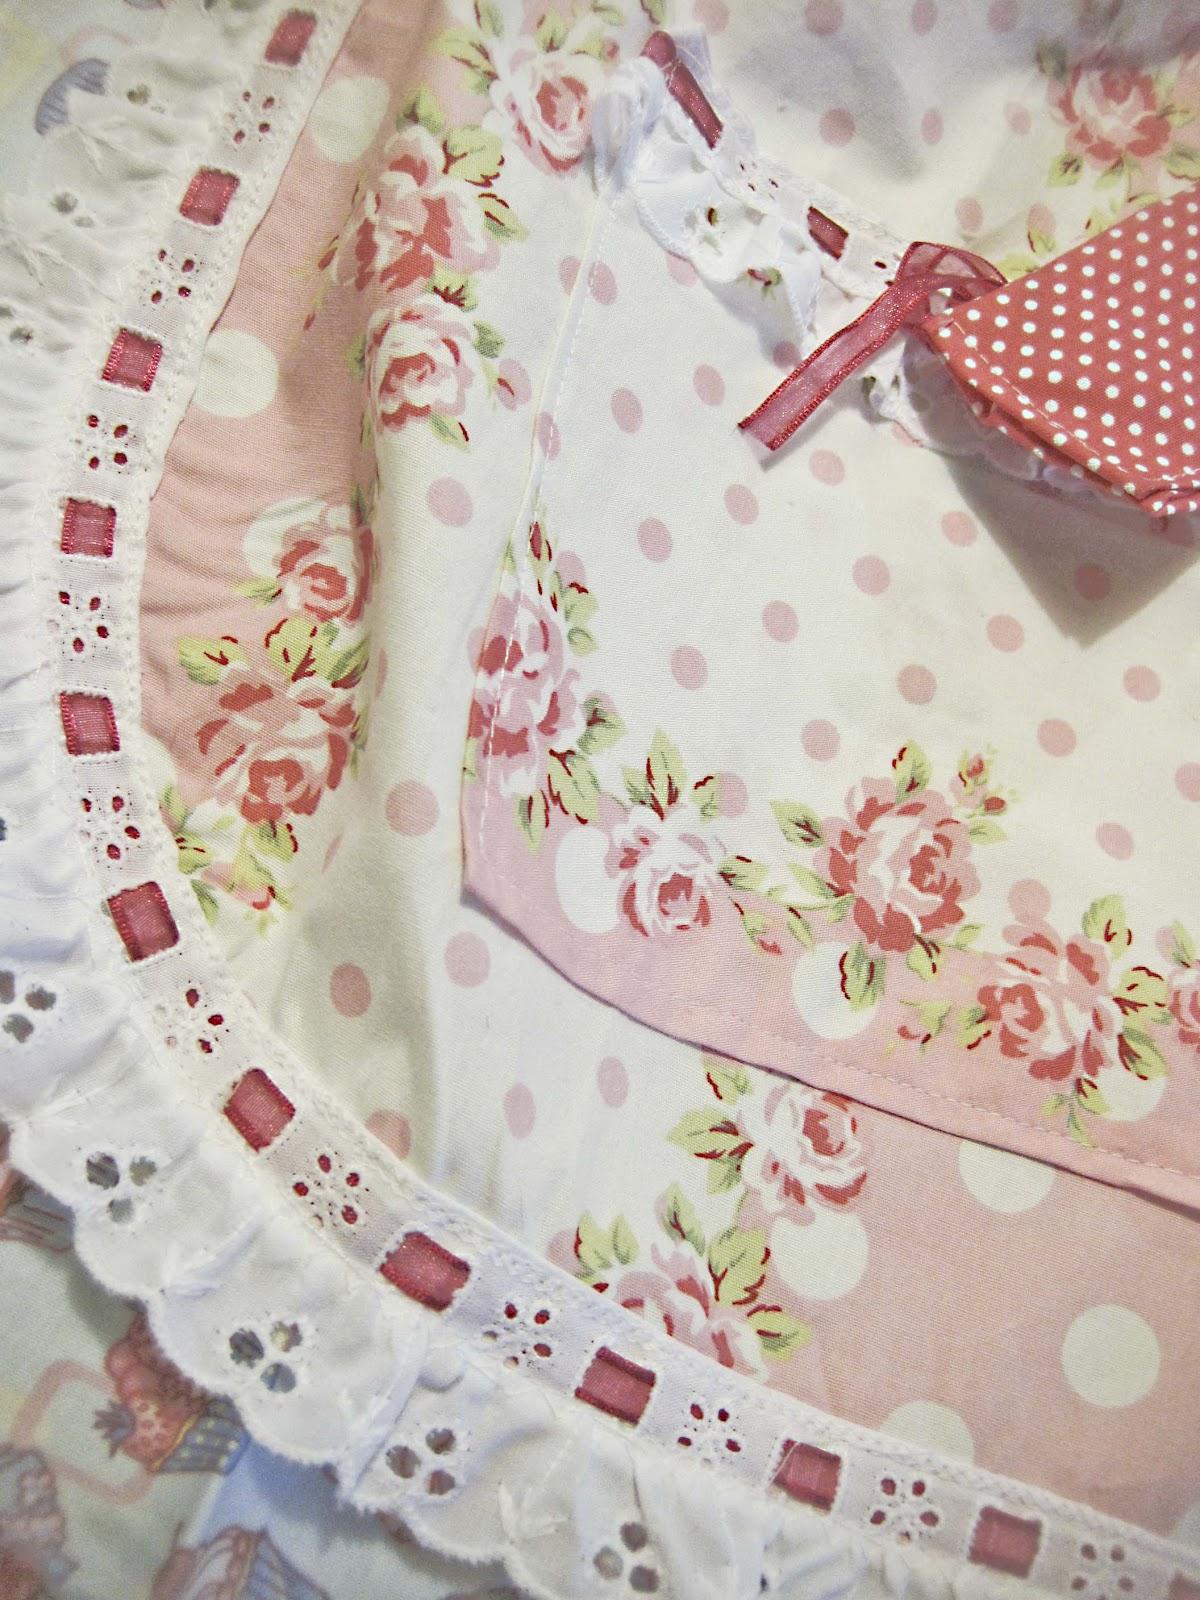 03e75dbc518 El cinturón está confeccionado con tela fucsia de topitos blancos, lo  podéis atar atrás o delante, como más os guste